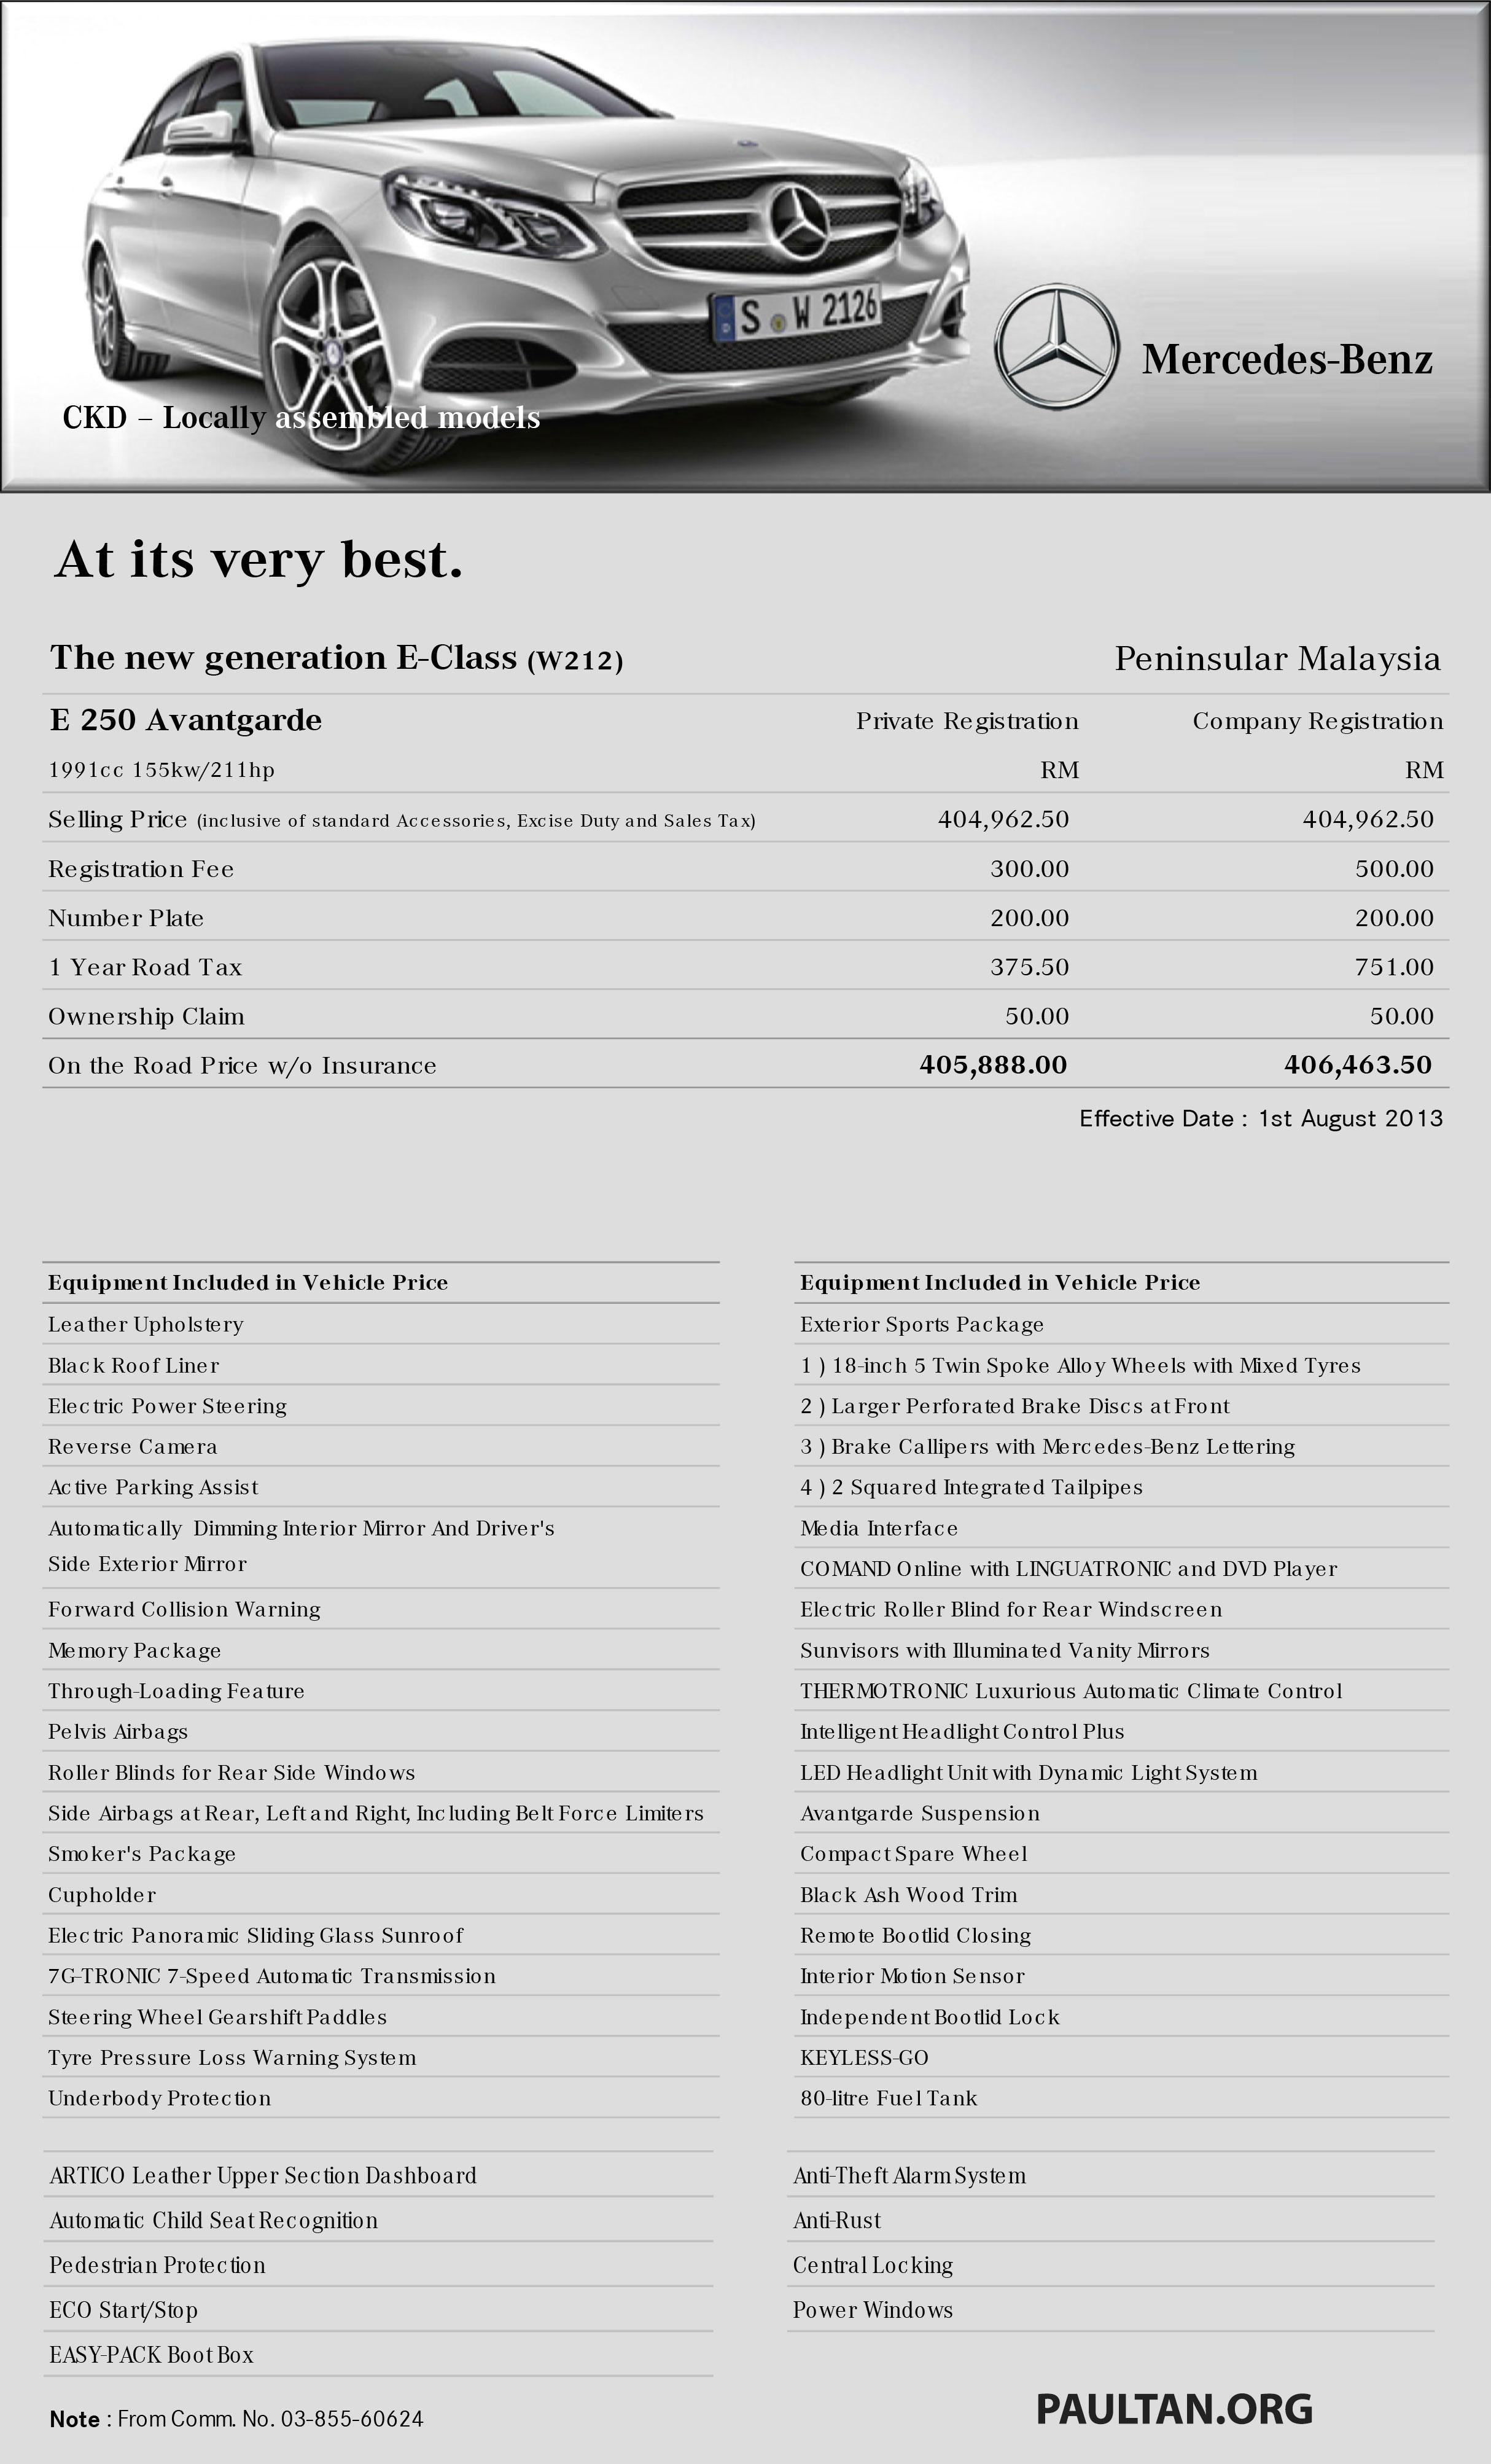 W212 Mercedes Benz E Class Facelift Malaysian Specs Released U2013 E200 And  E250 Avantgarde Paul Tan   Image 191239